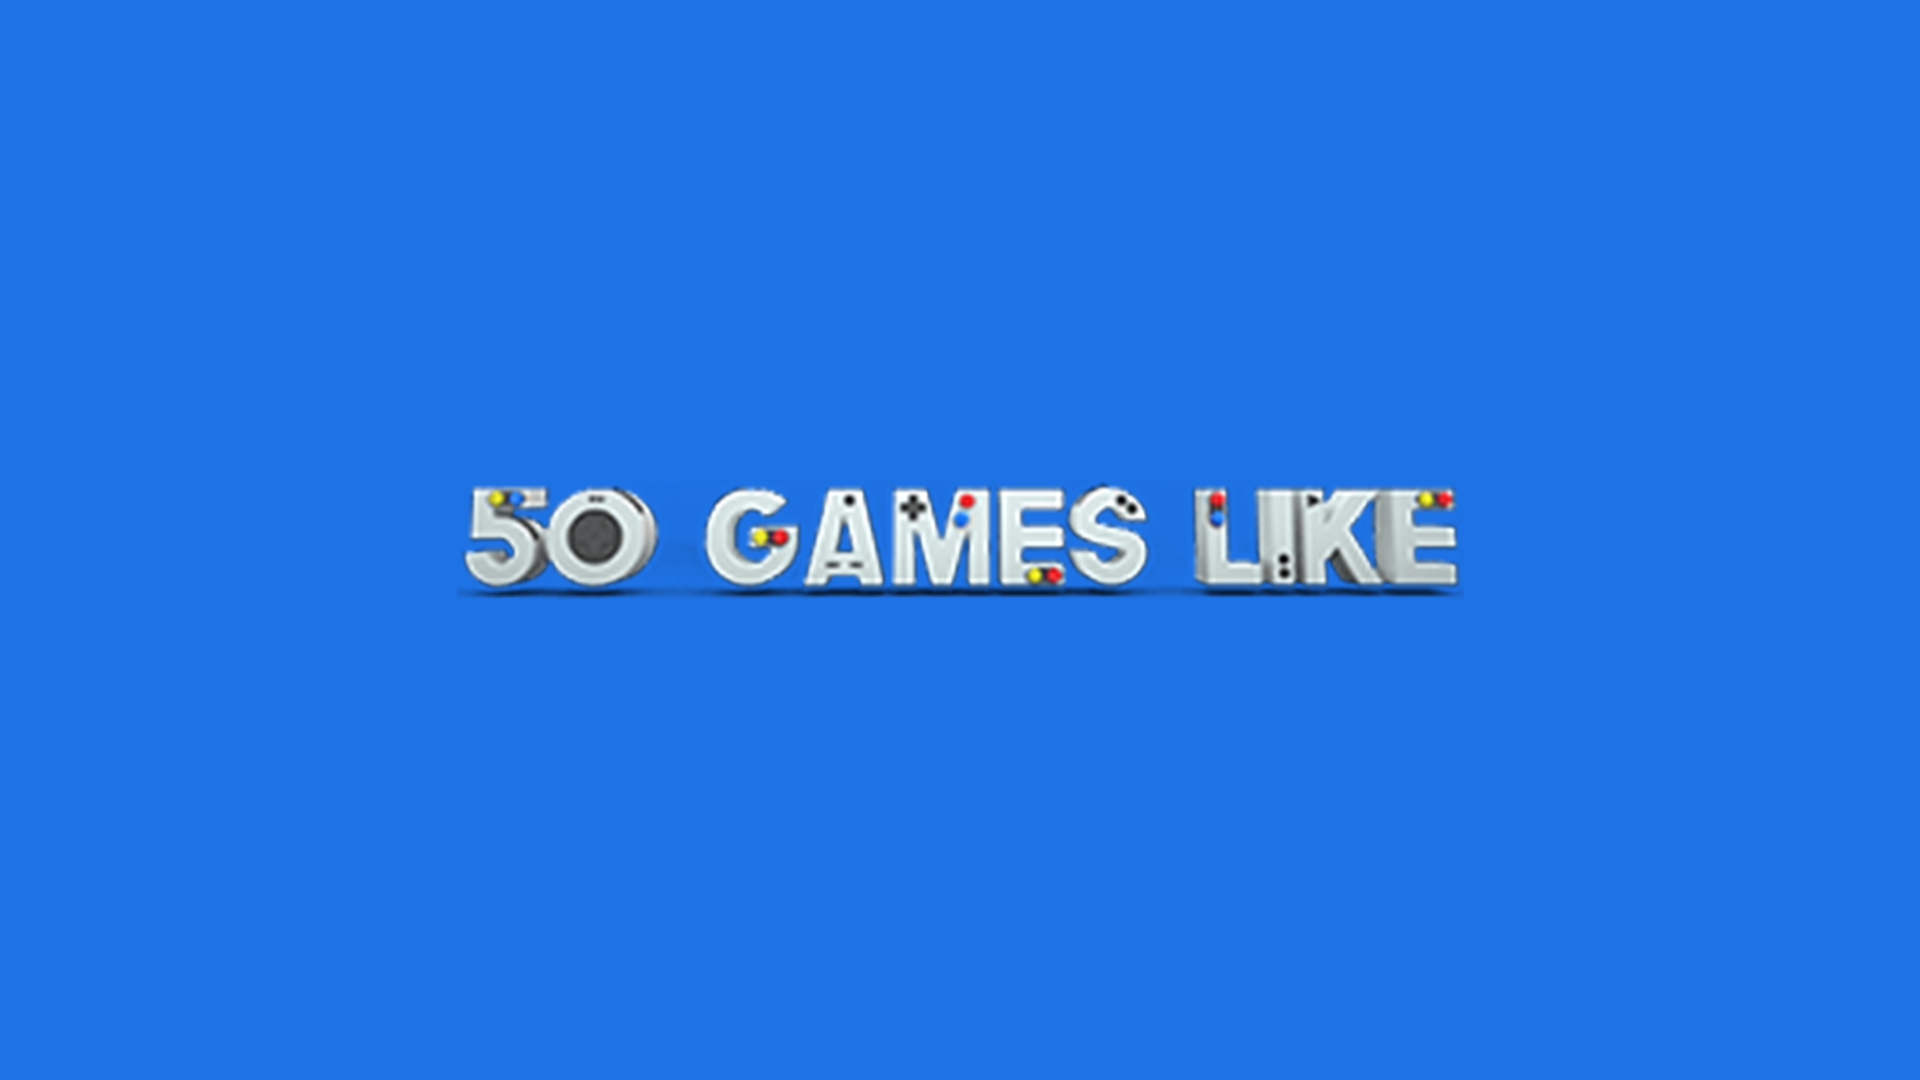 50-Games-Like-Logo